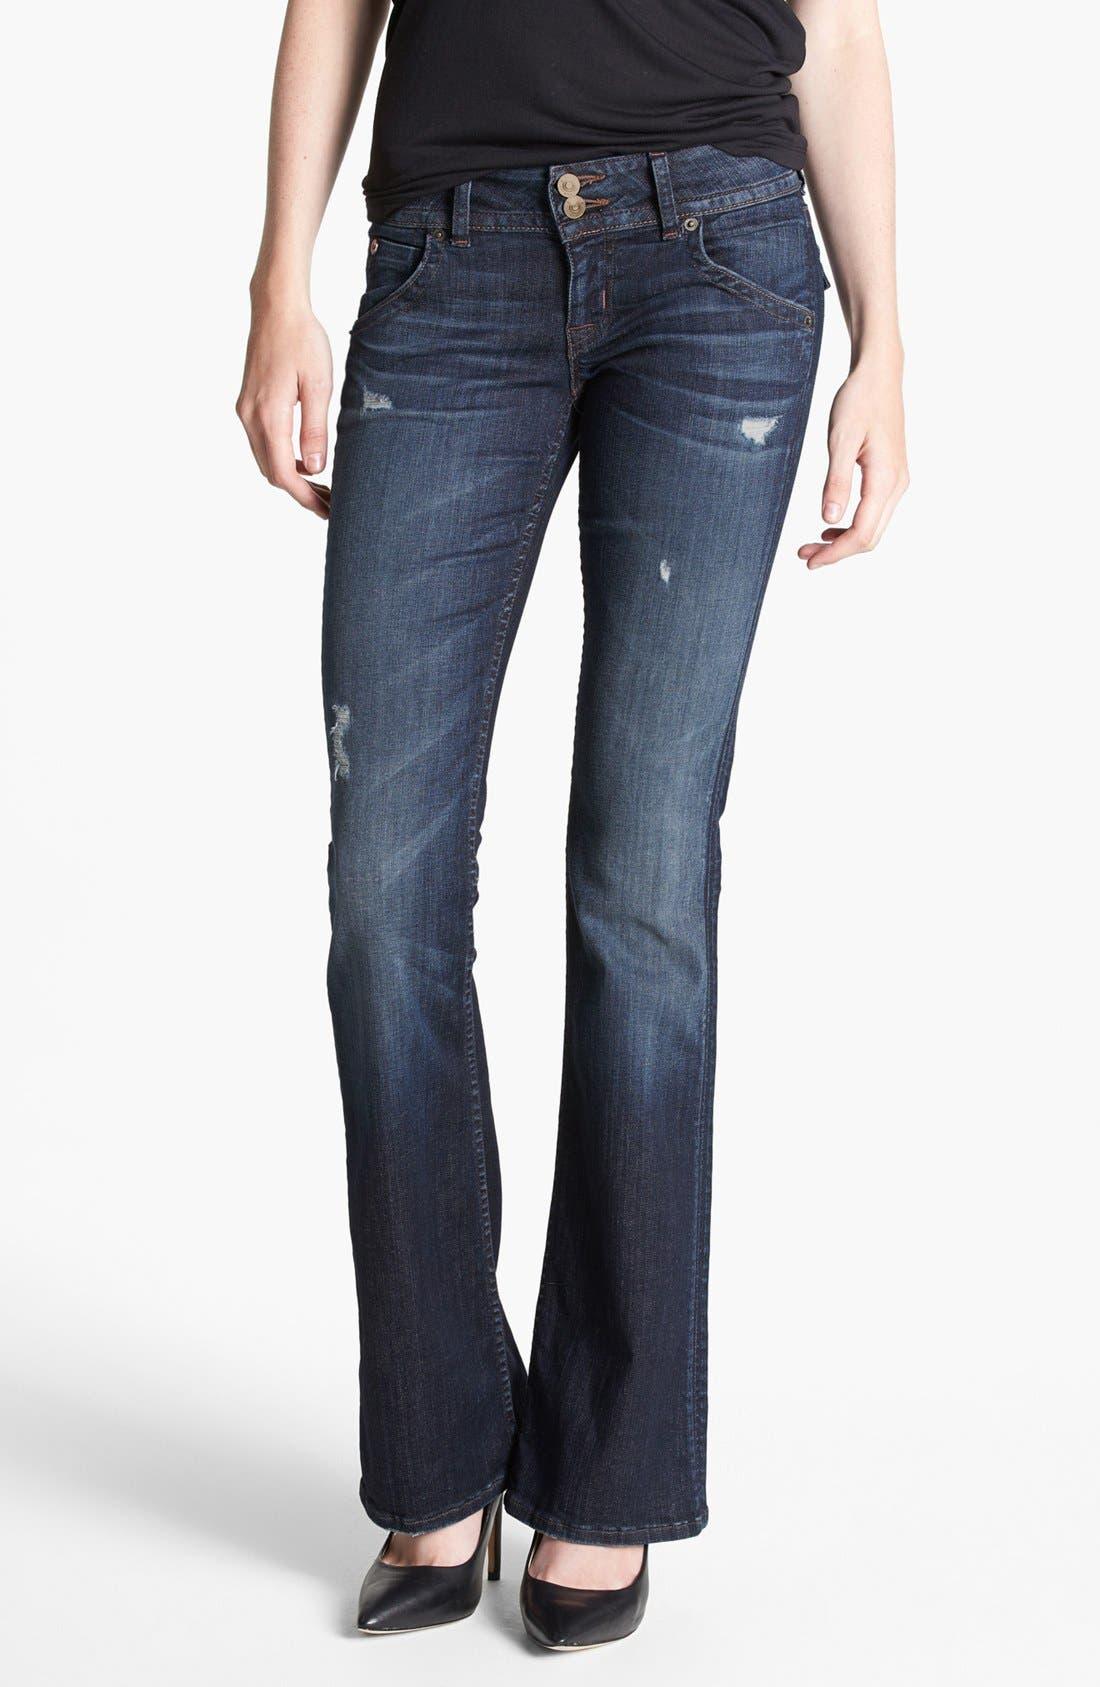 Main Image - Hudson Jeans Distressed Signature Bootcut Jeans (Escape)